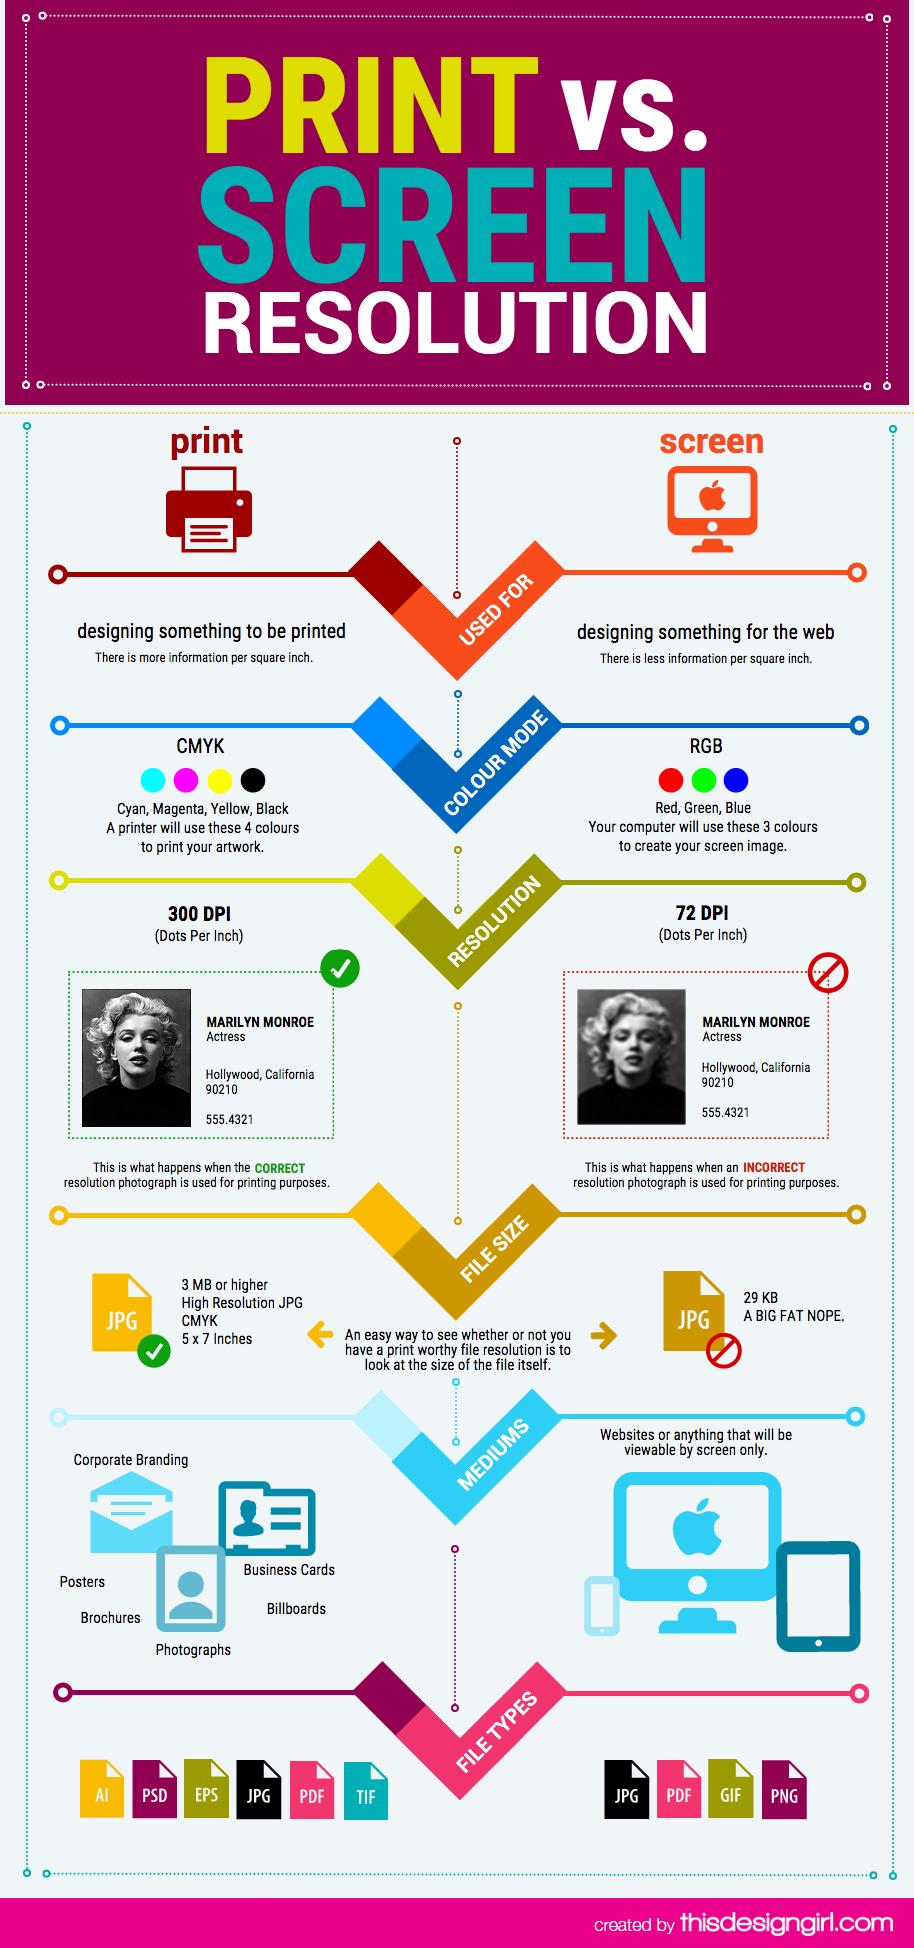 Screen Resolution vs Print Resolution Infographic.